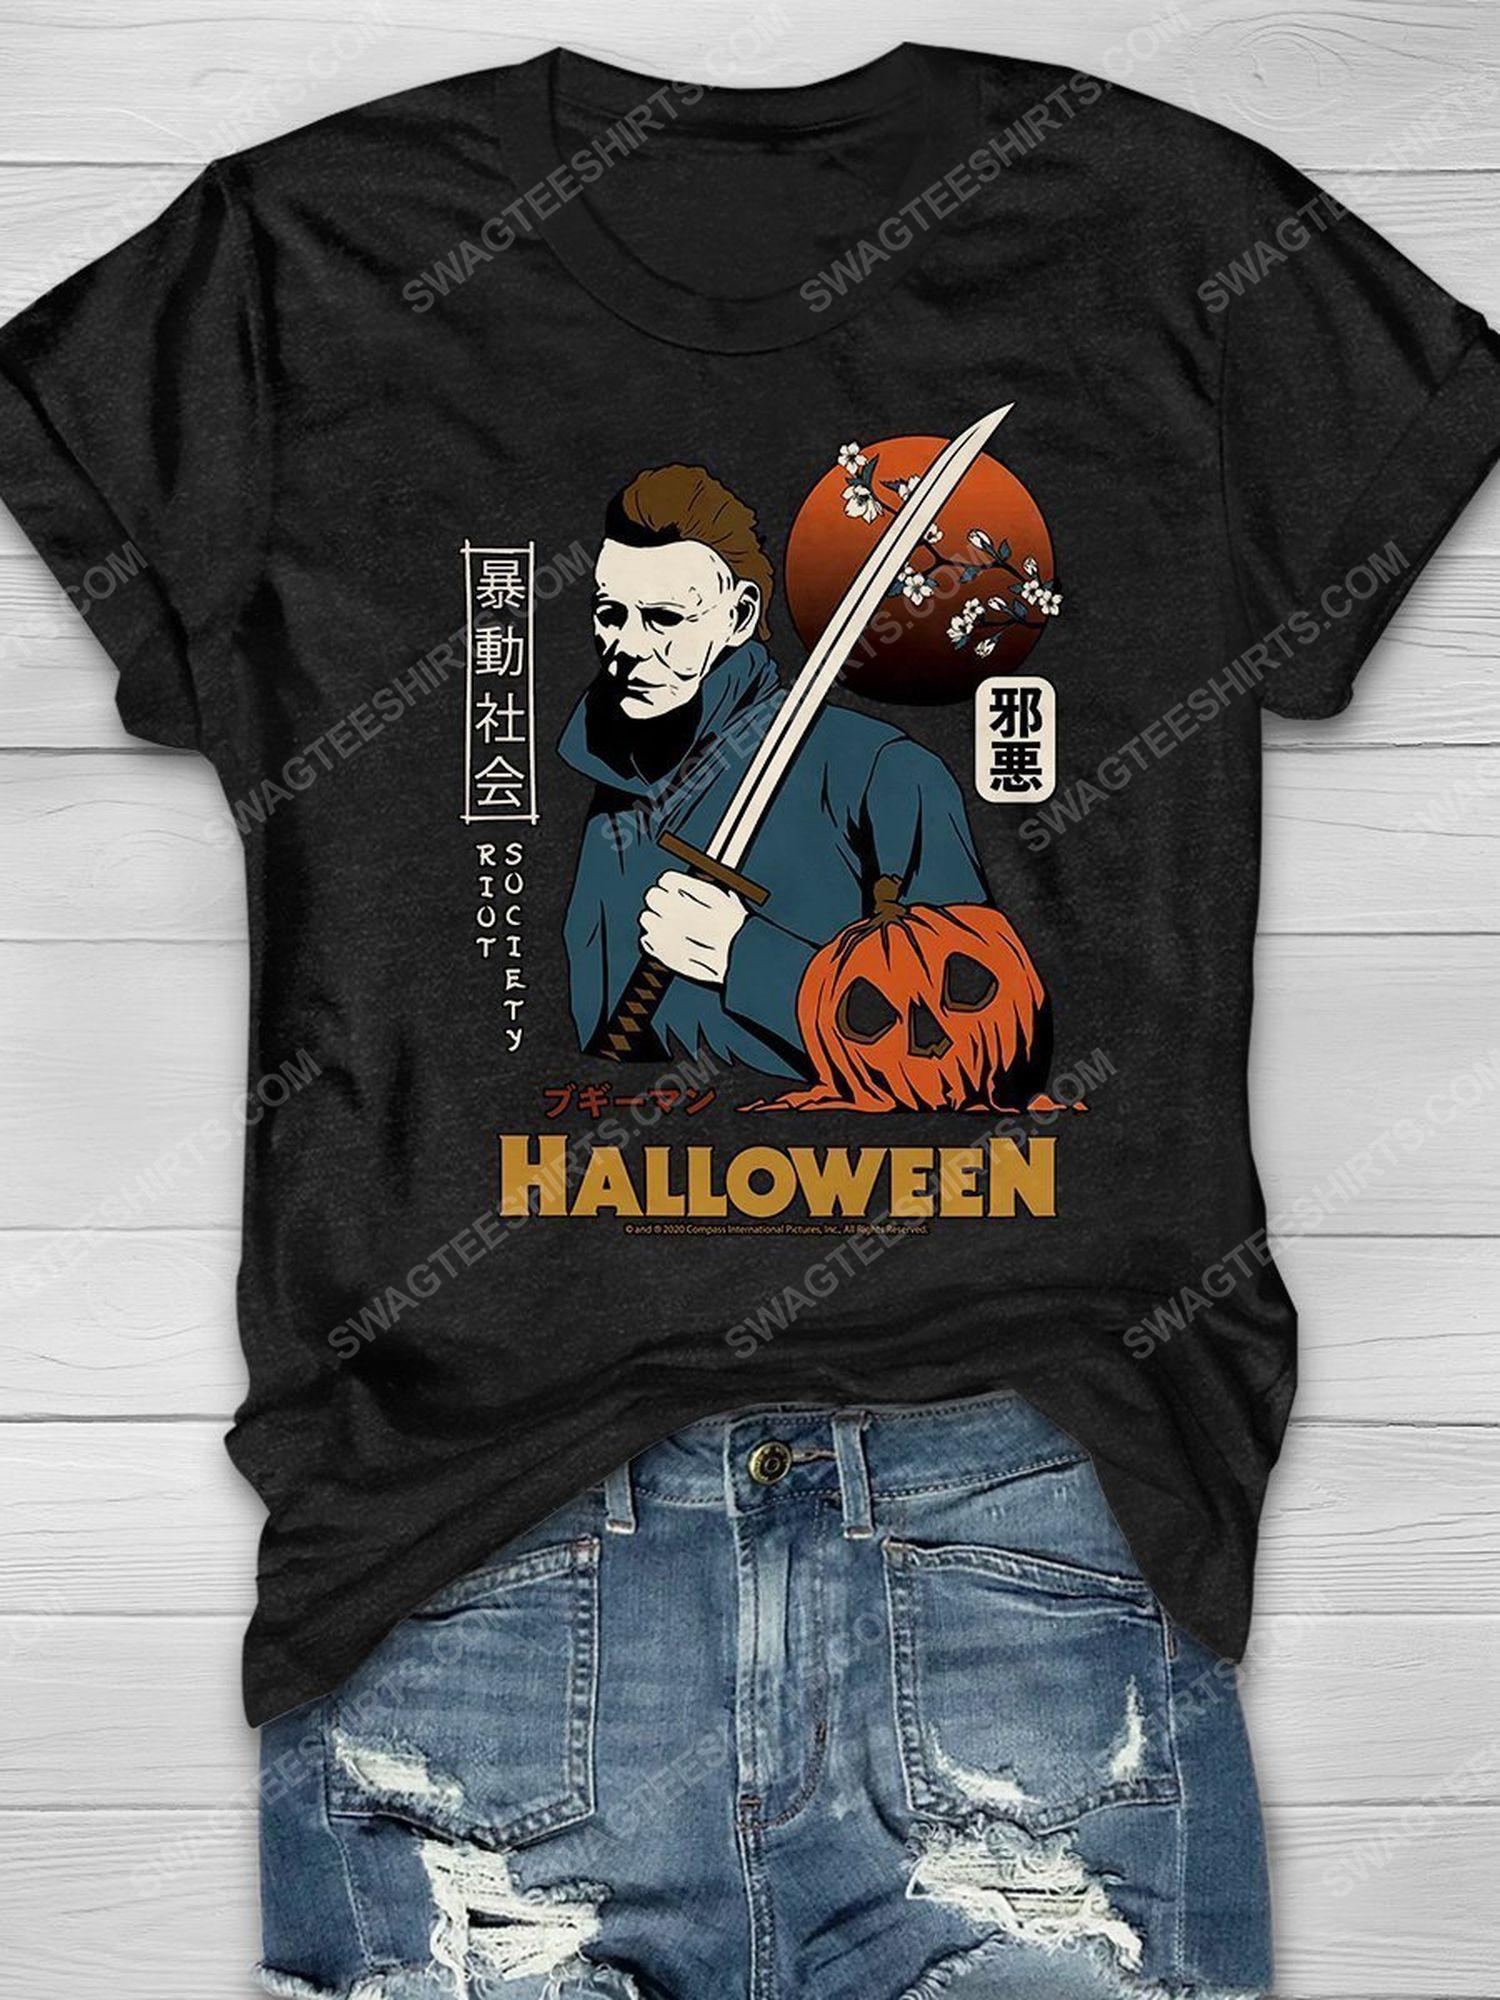 Halloween Michael myers with katana shirt 1 - Copy